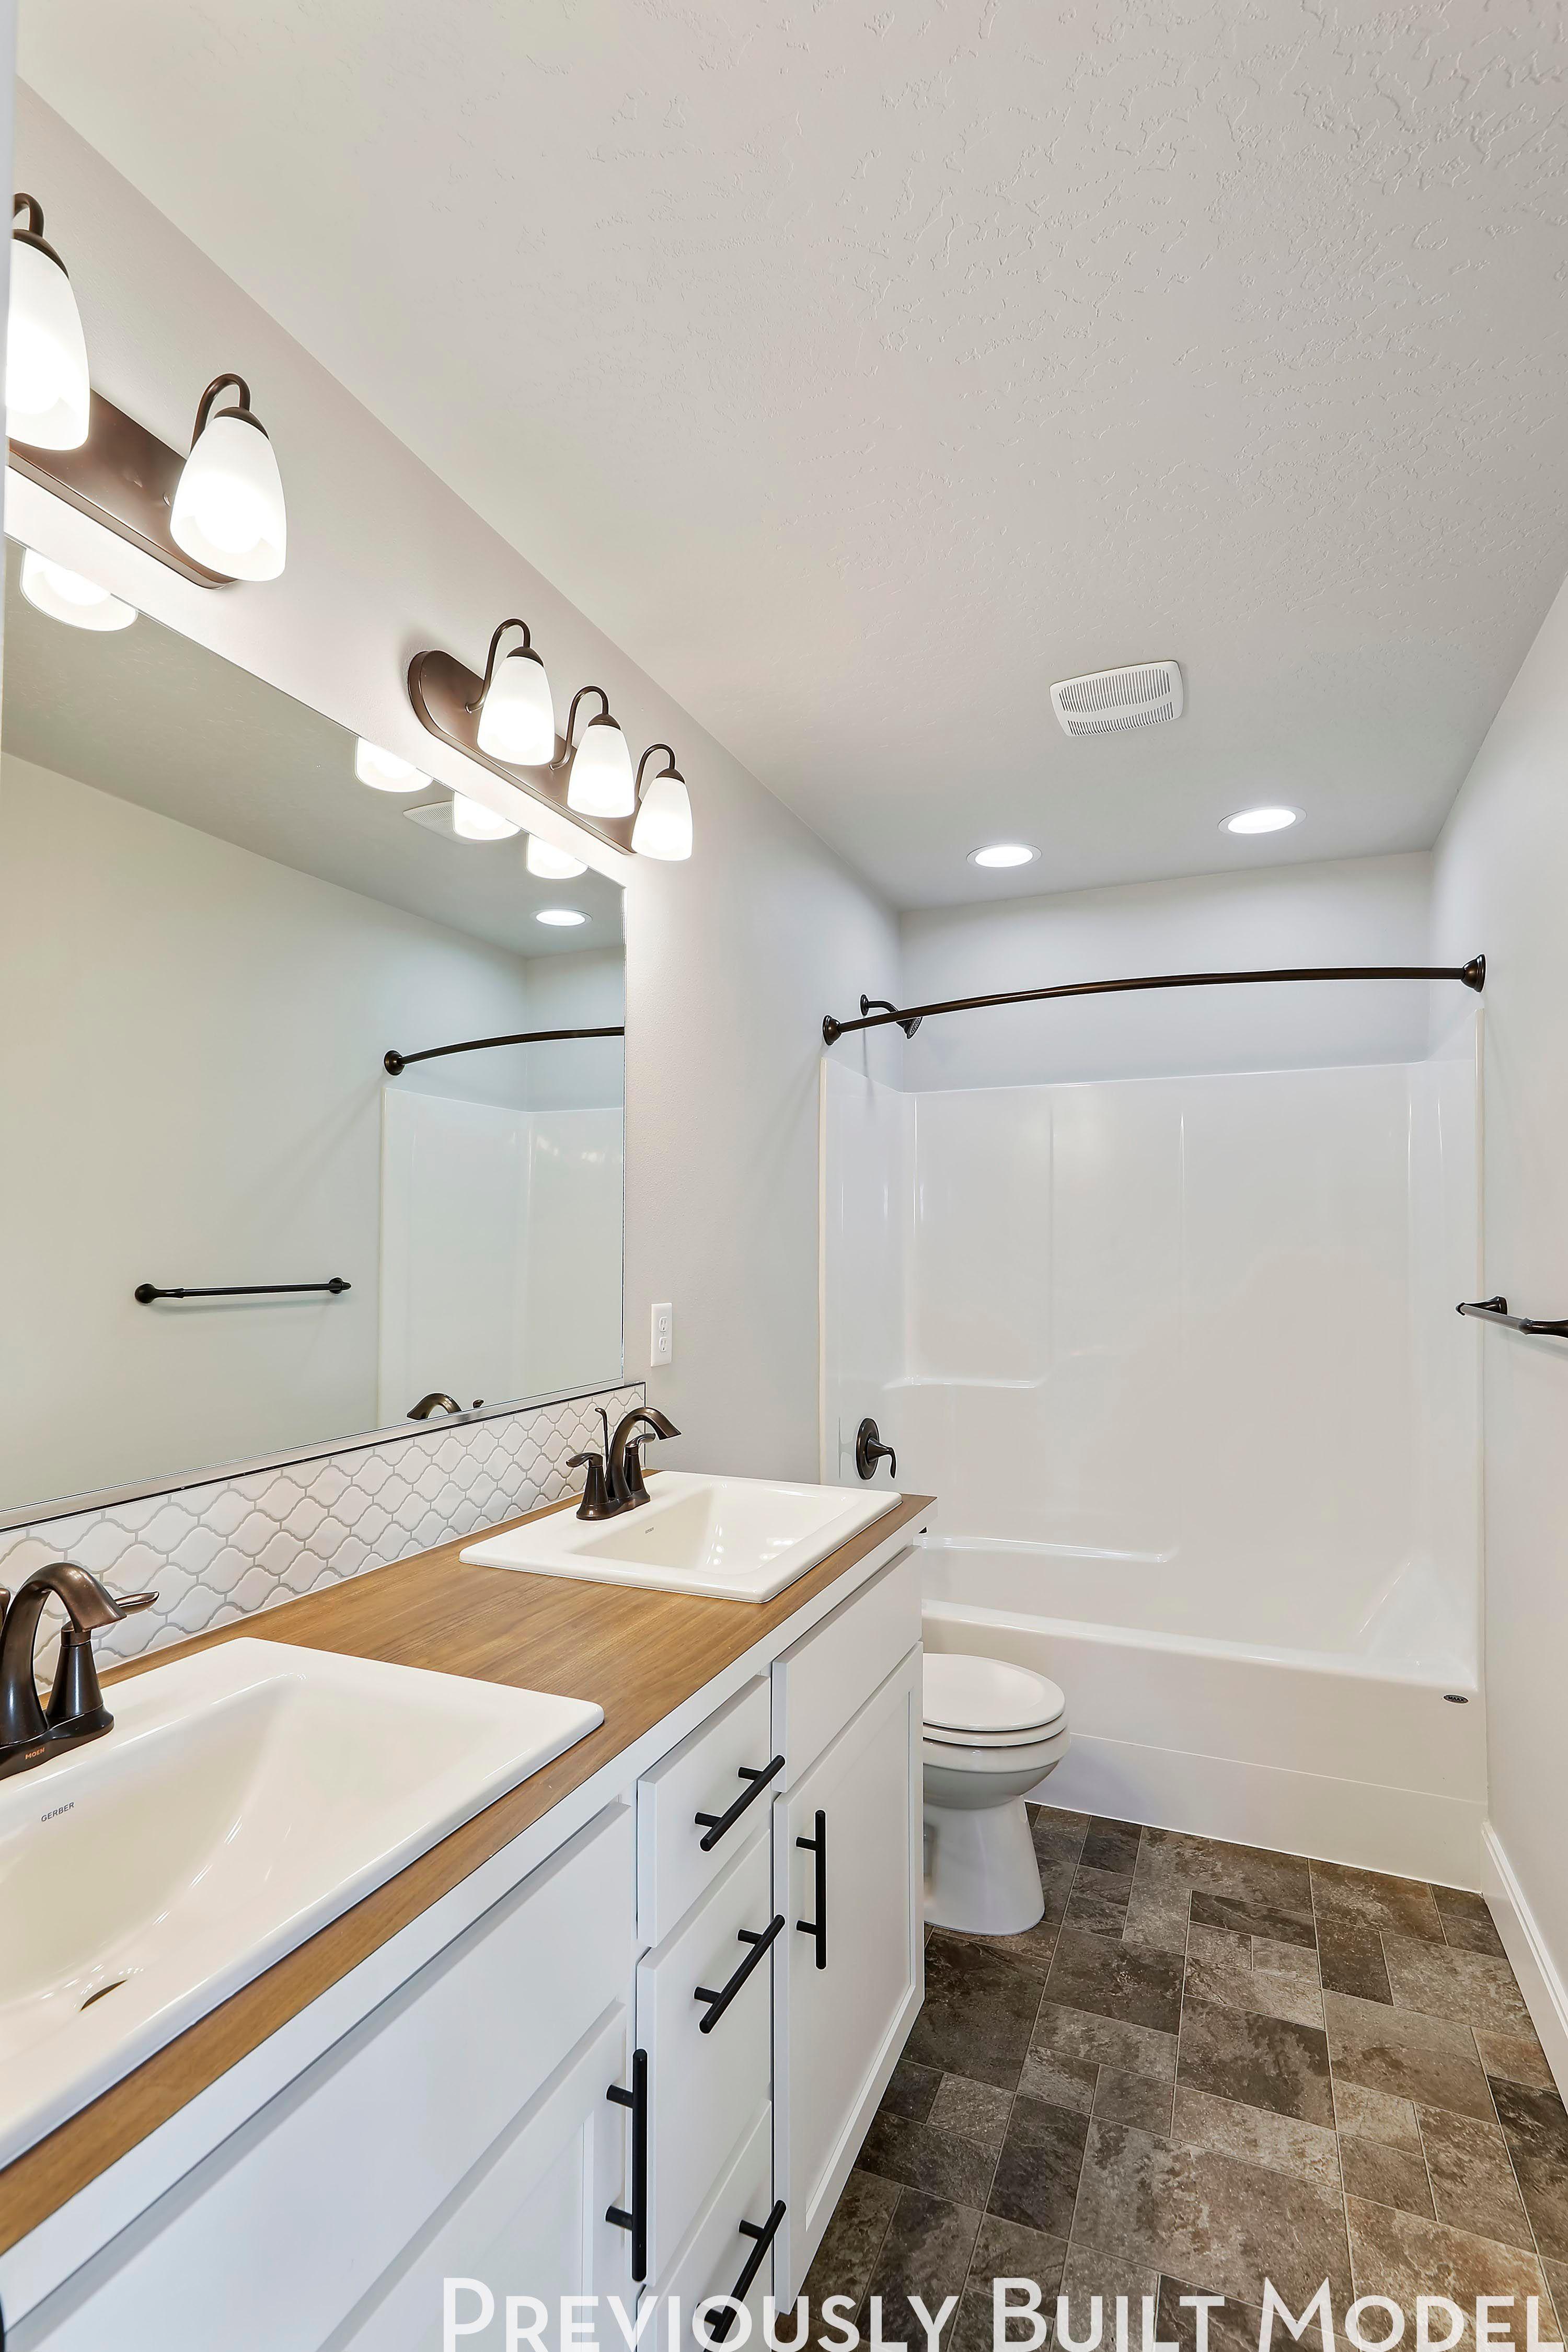 Bathroom featured in The Teton By RYN Built Homes in Spokane-Couer d Alene, WA